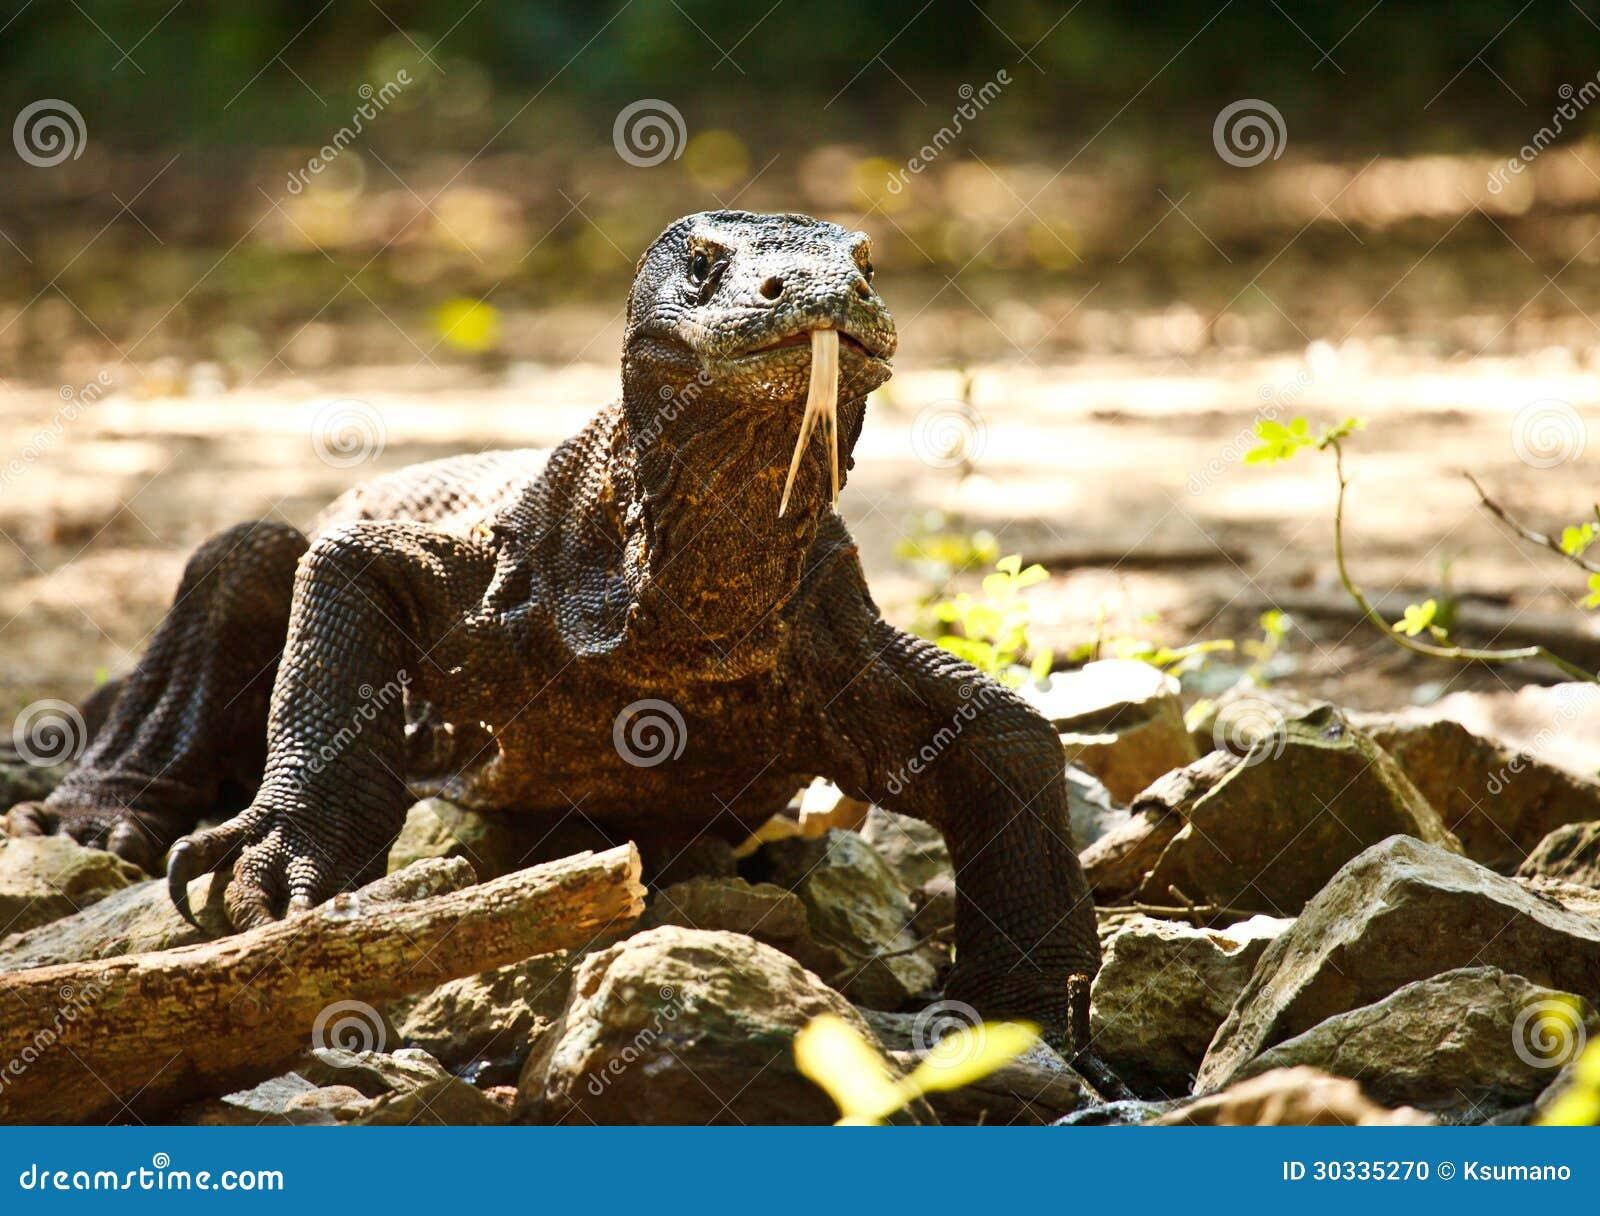 Download Komodo Dragon stock photo. Image of wildlife, komodoensis - 30335270